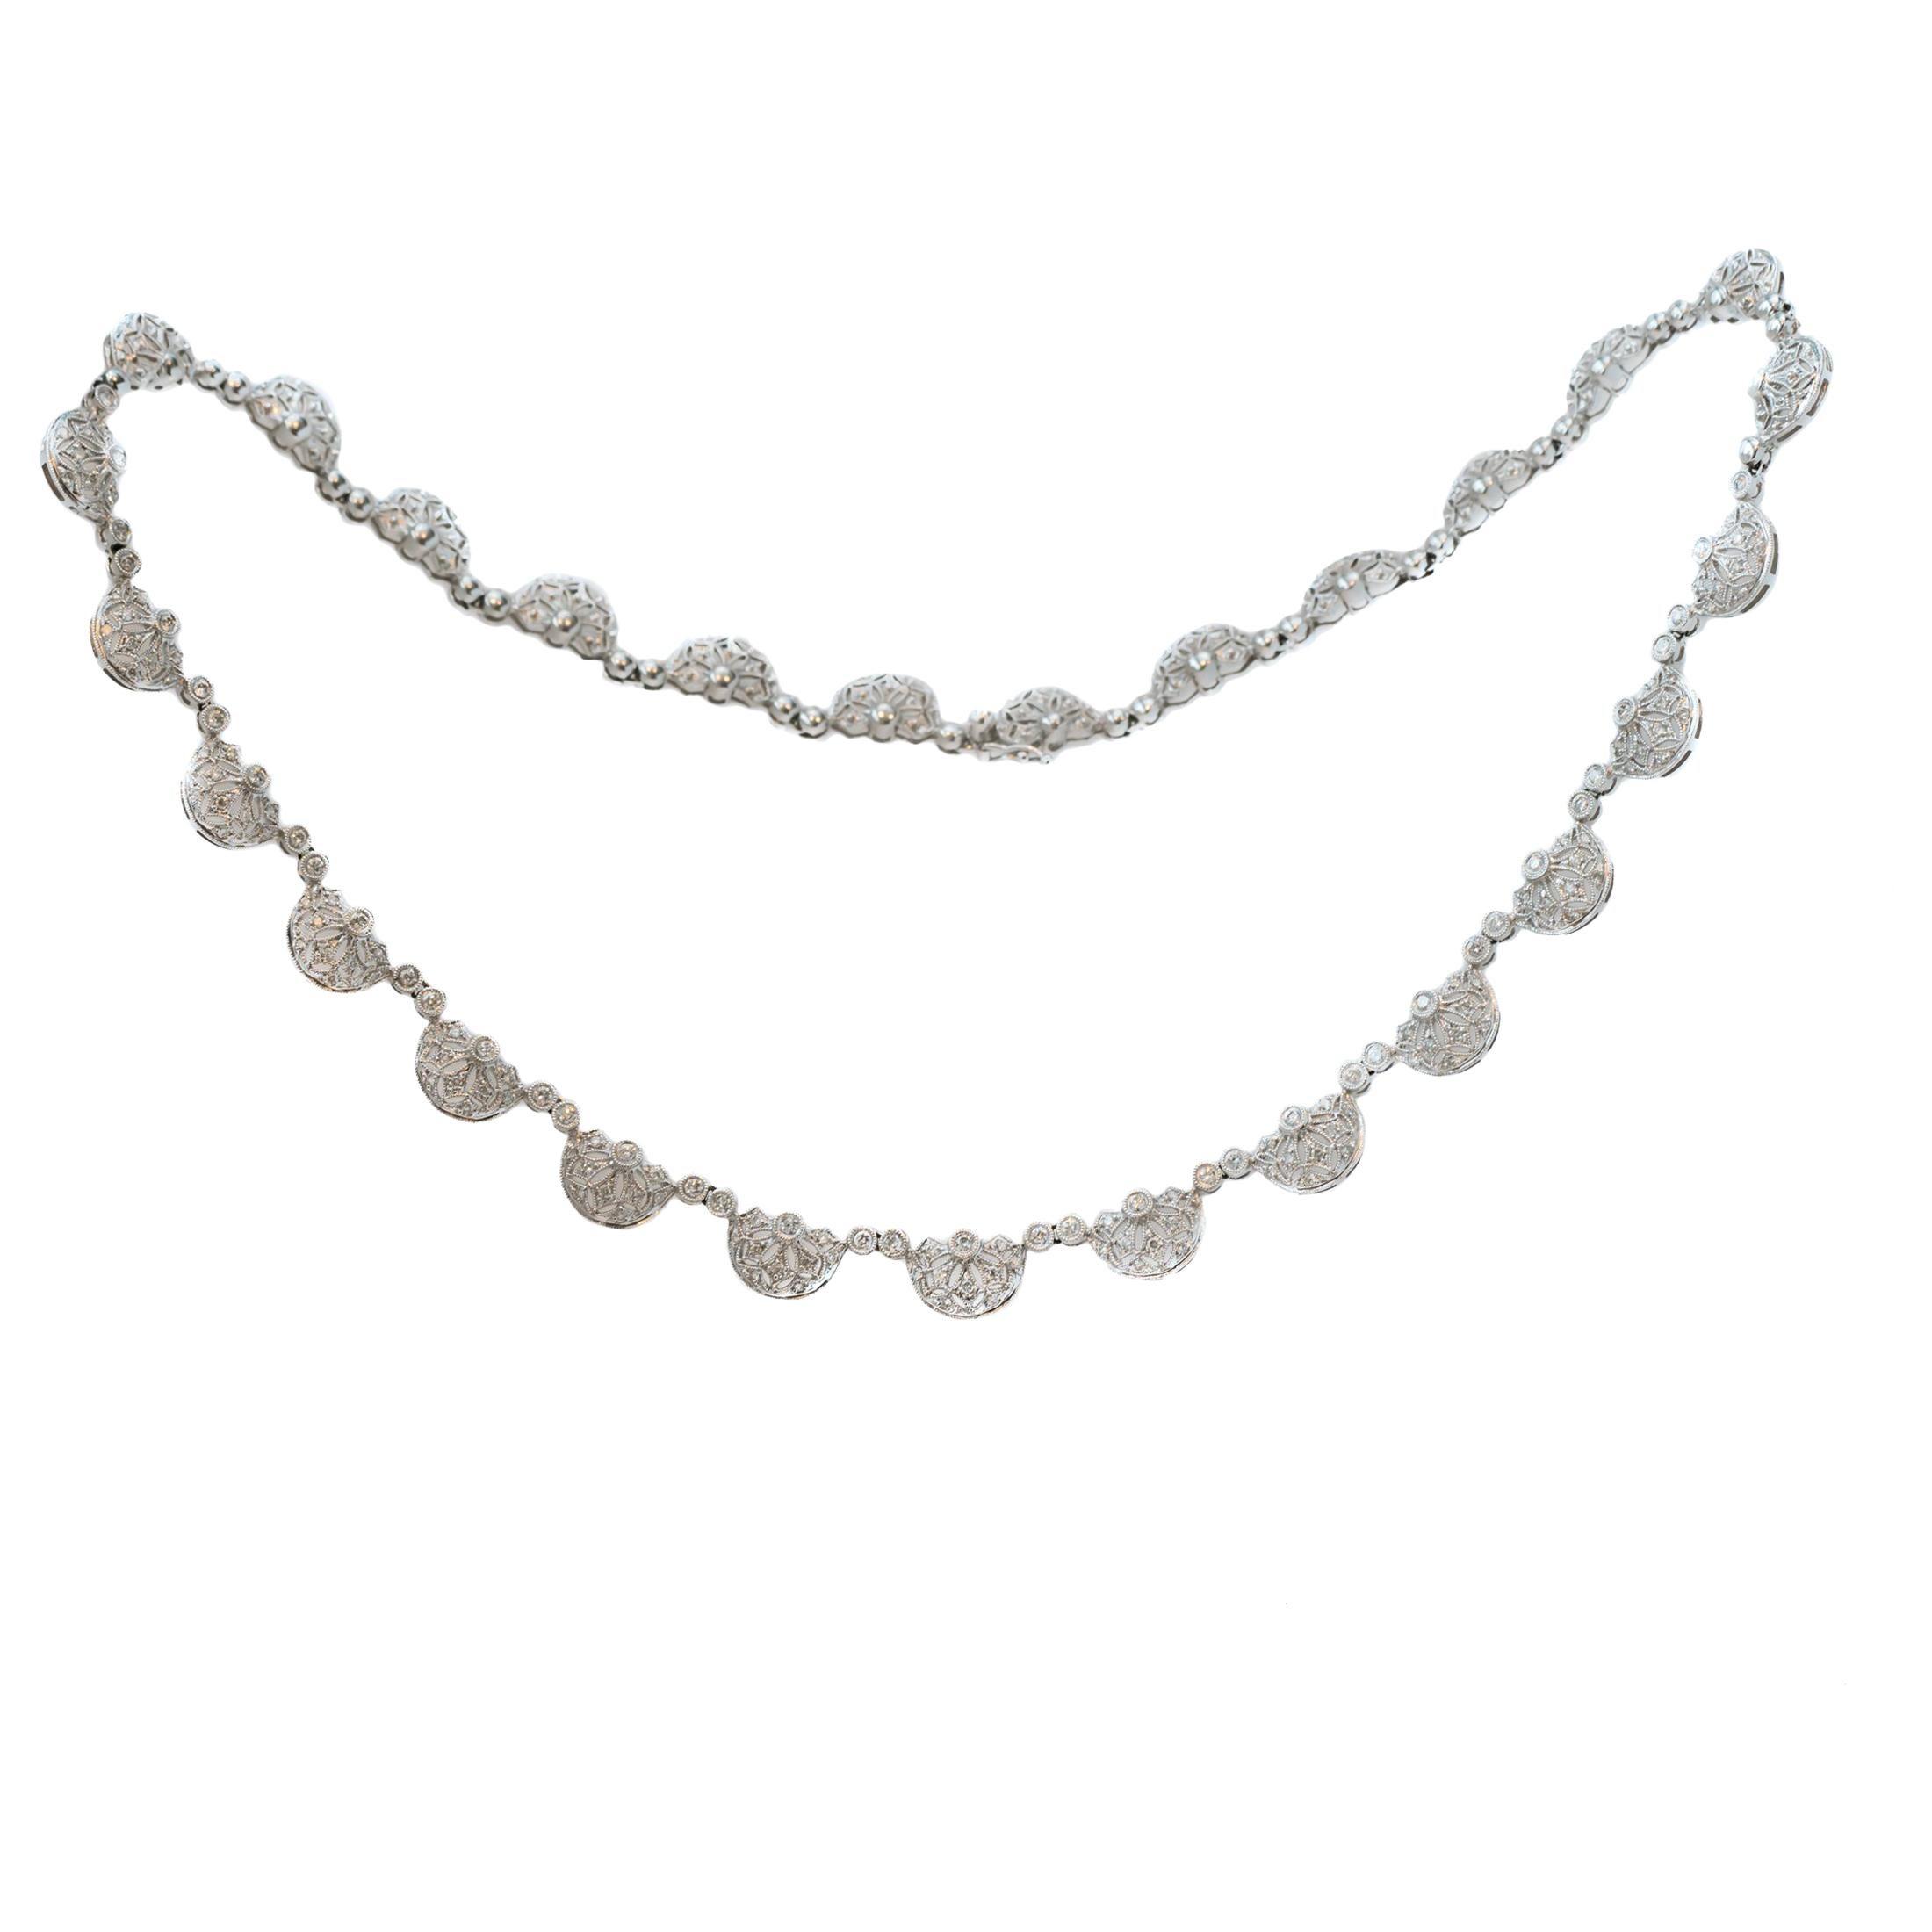 3 Carat Diamond and 18 Karat White Gold Princess Necklace